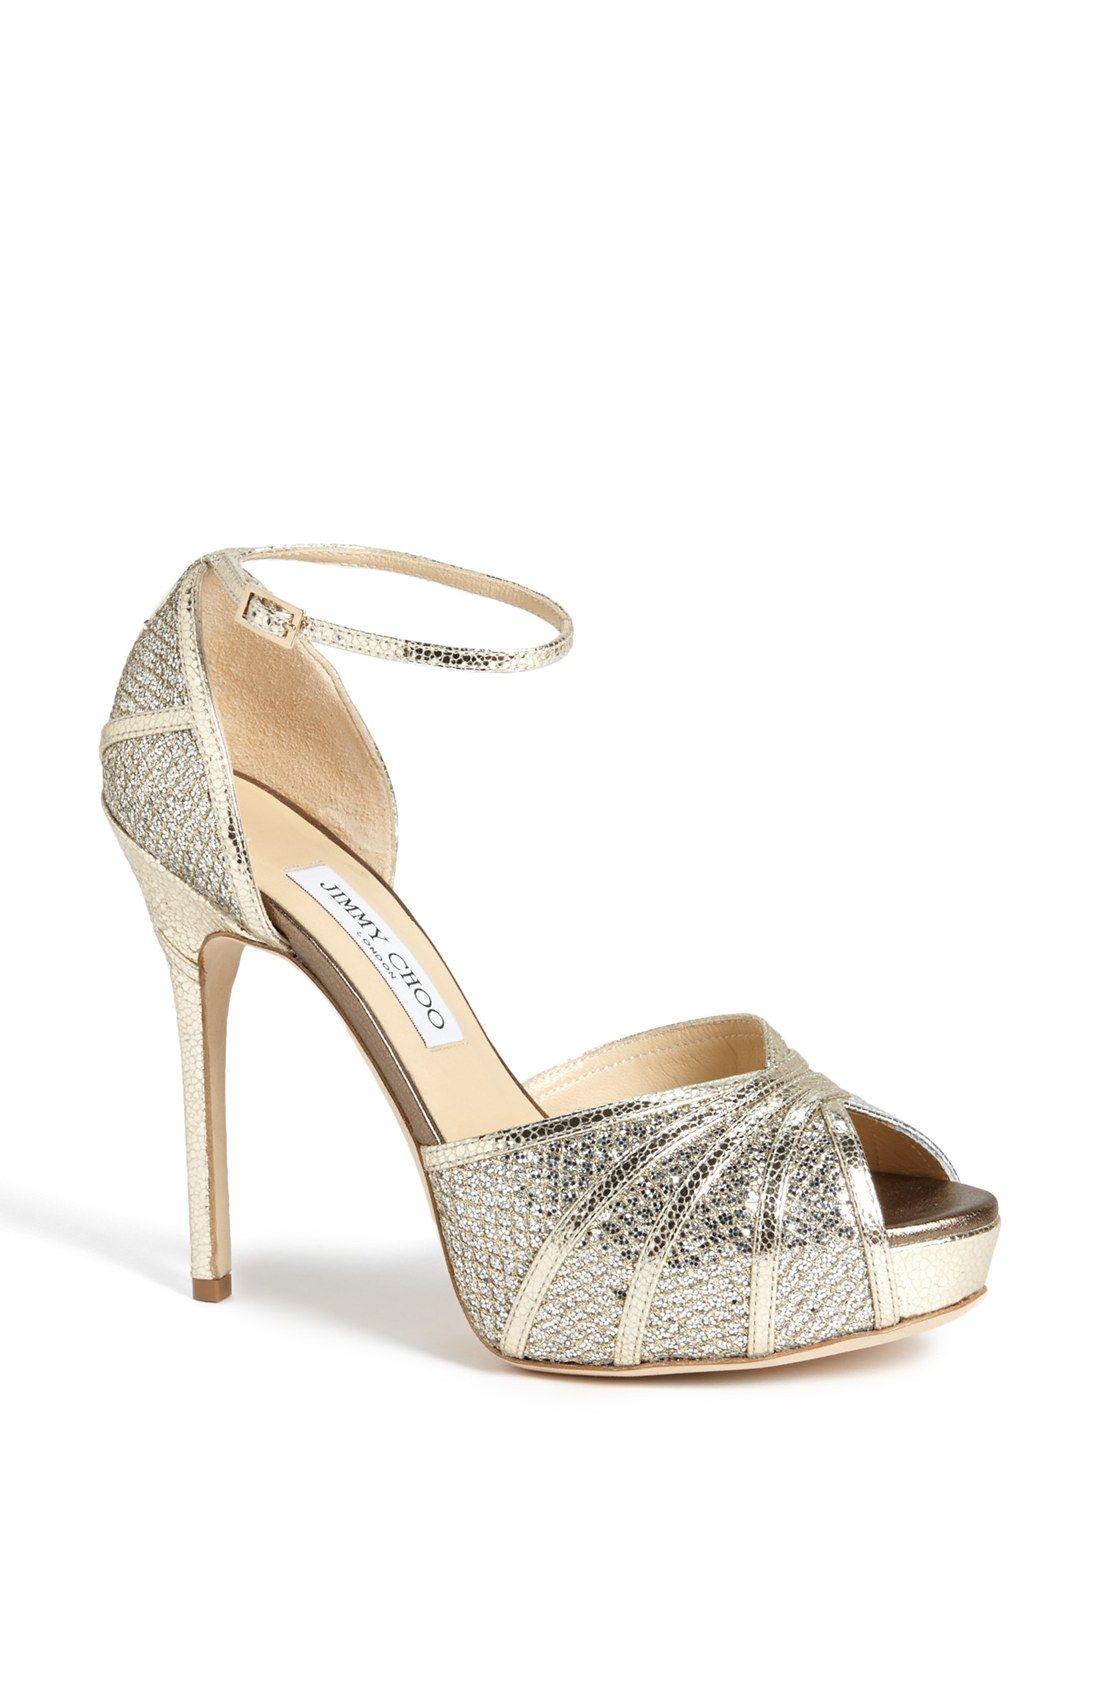 Jimmy Choo Shoes Pinterest Schuhe Schuhe Damen And Damenschuhe